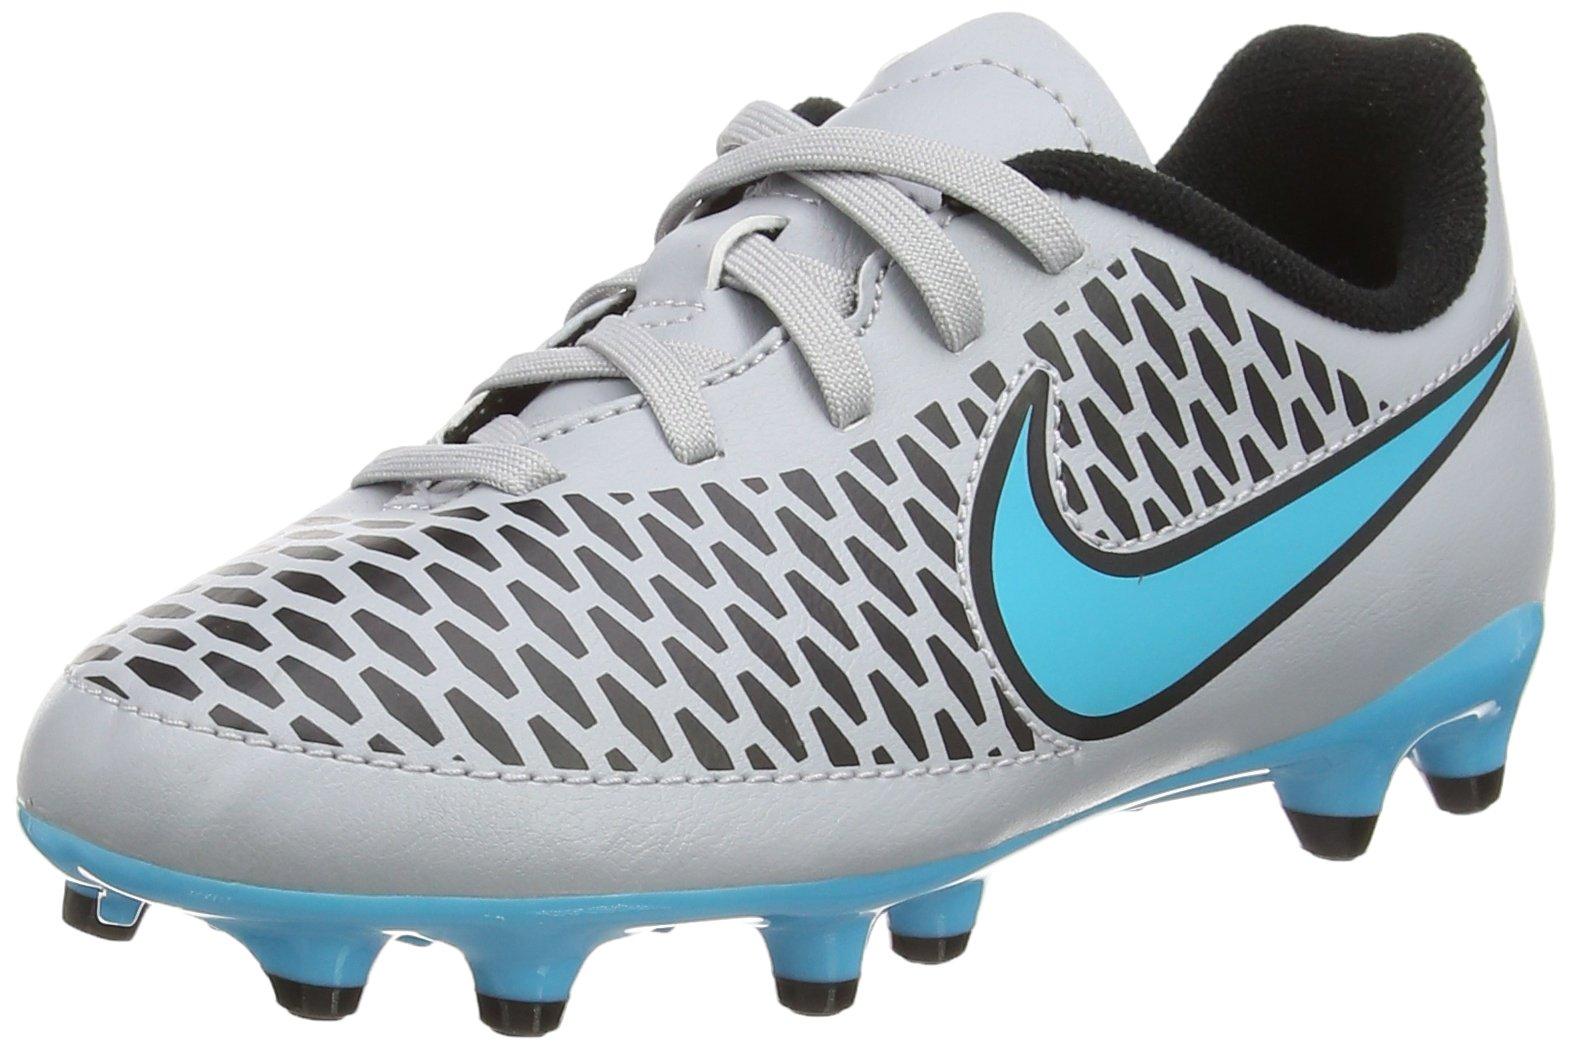 Nike Jr. Kids Magista Onda FG Soccer Cleat (Wolf Grey, Turquoise Blue) (5.5 M US Big Kid, Wolf Grey Turquoise Blue)